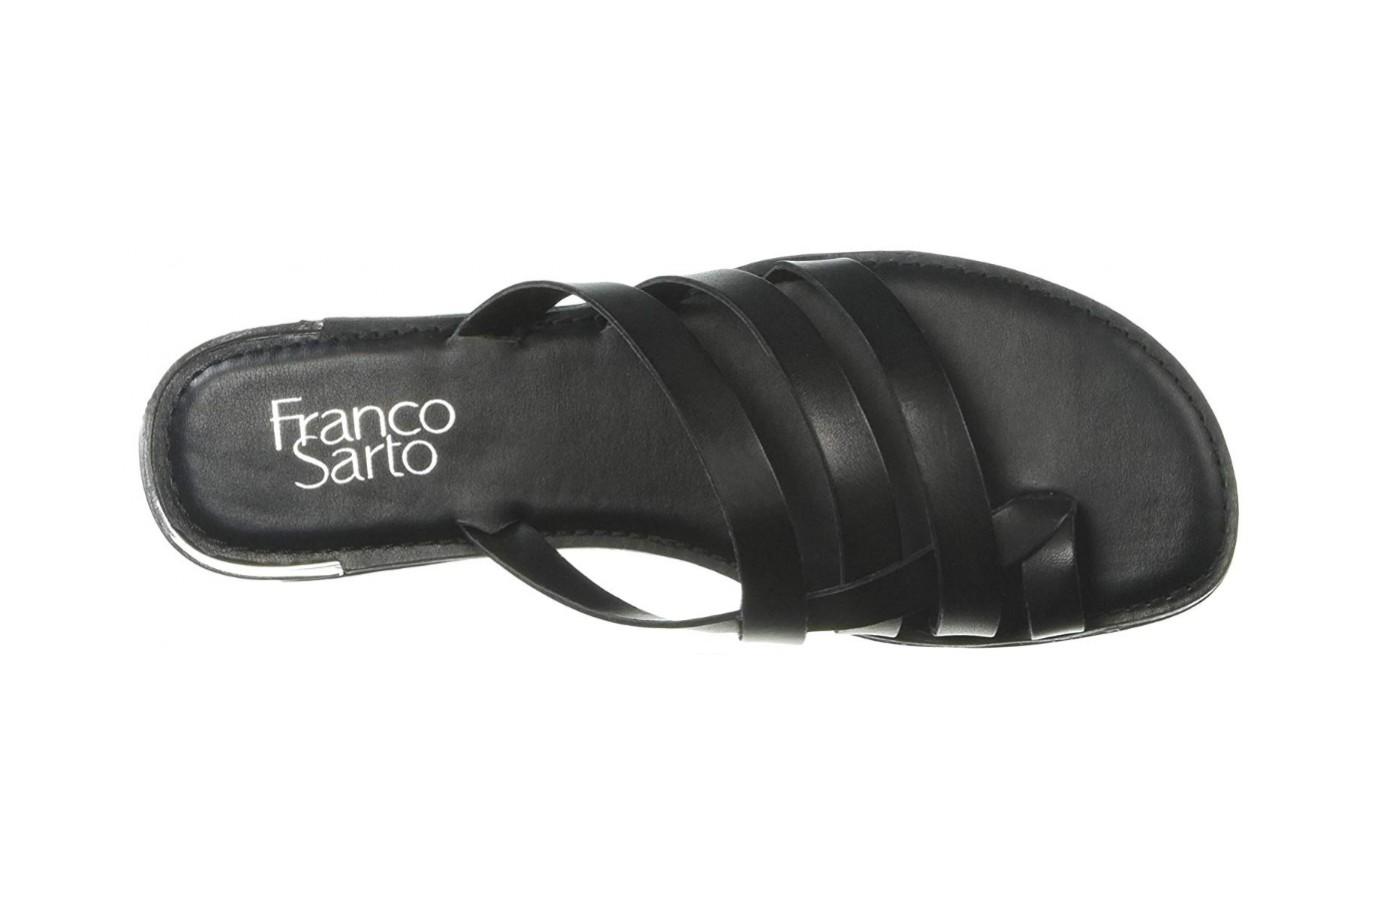 Franco Sarto Goddess Flat Upper